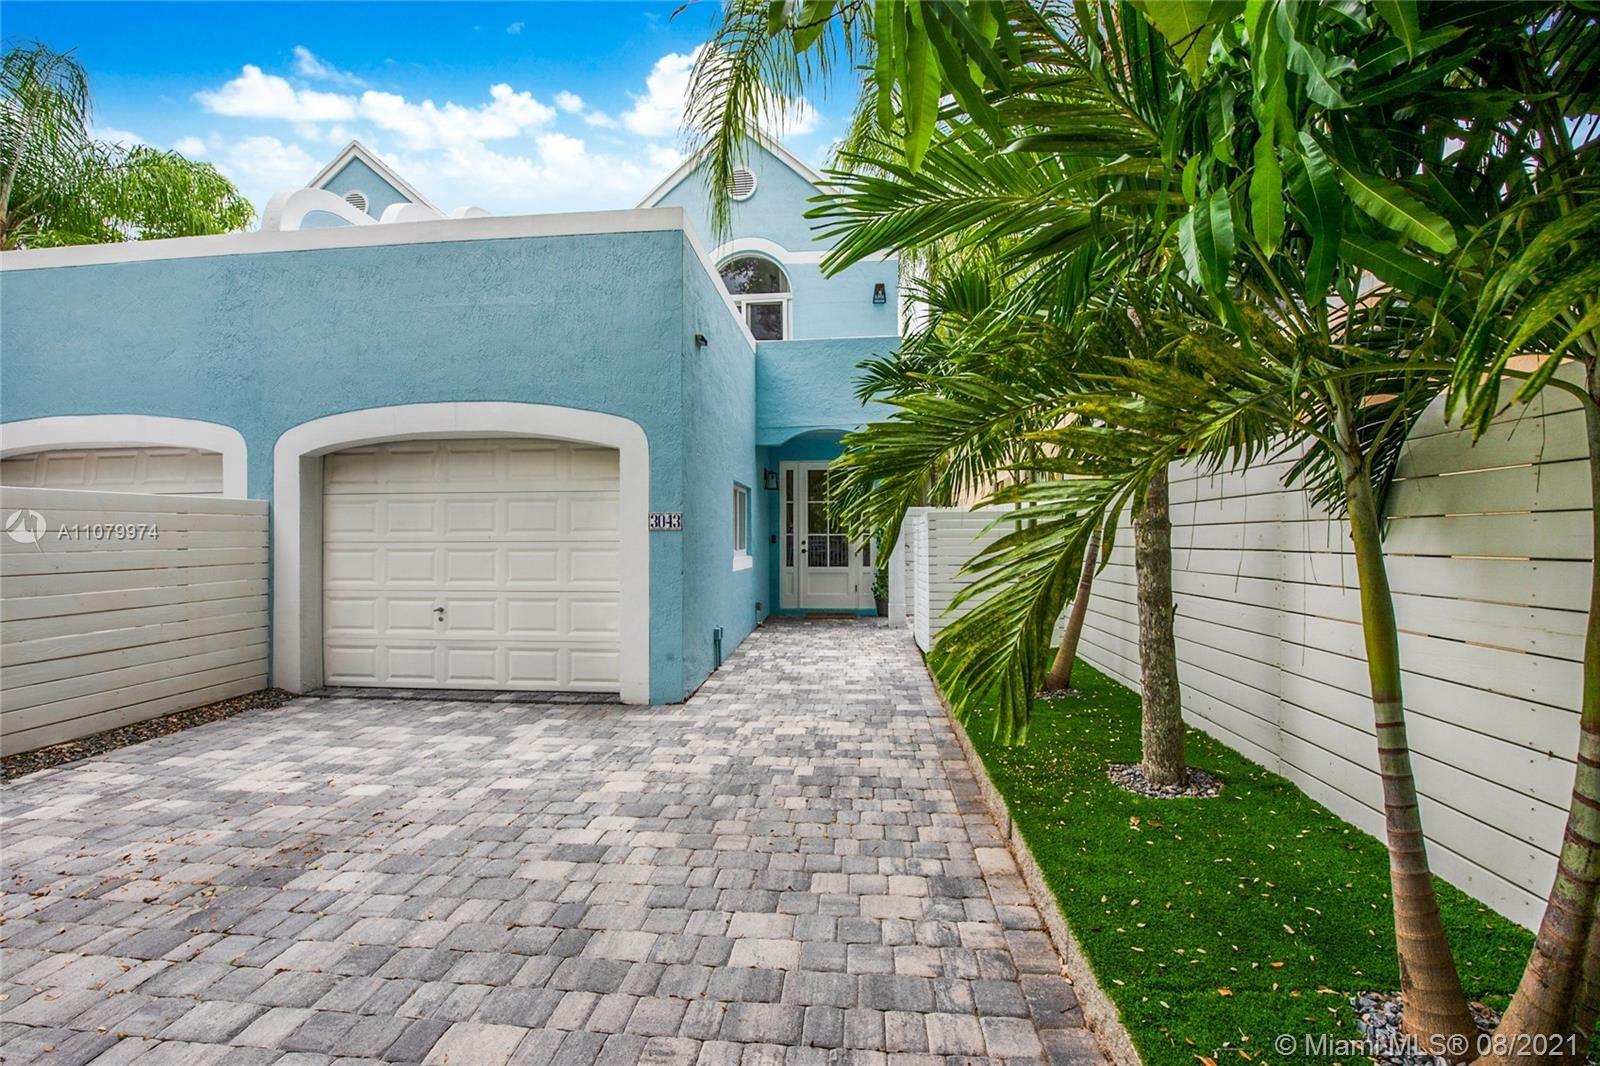 3043 Mary St #3043, Miami, FL 33133 - #: A11079974